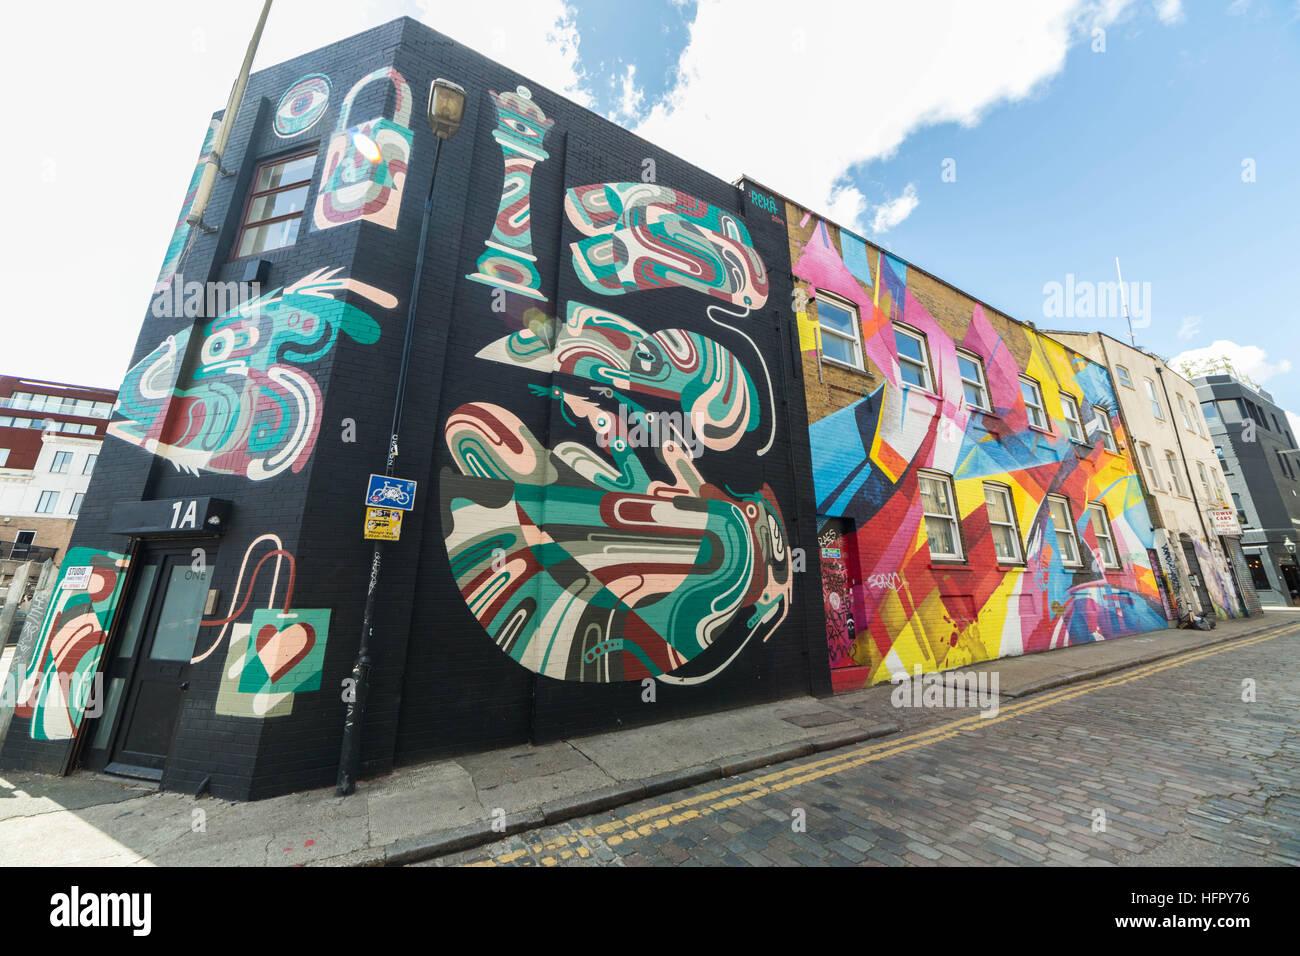 Shoreditch and Brick Lane creative graffiti and social art in east London, UK Stock Photo